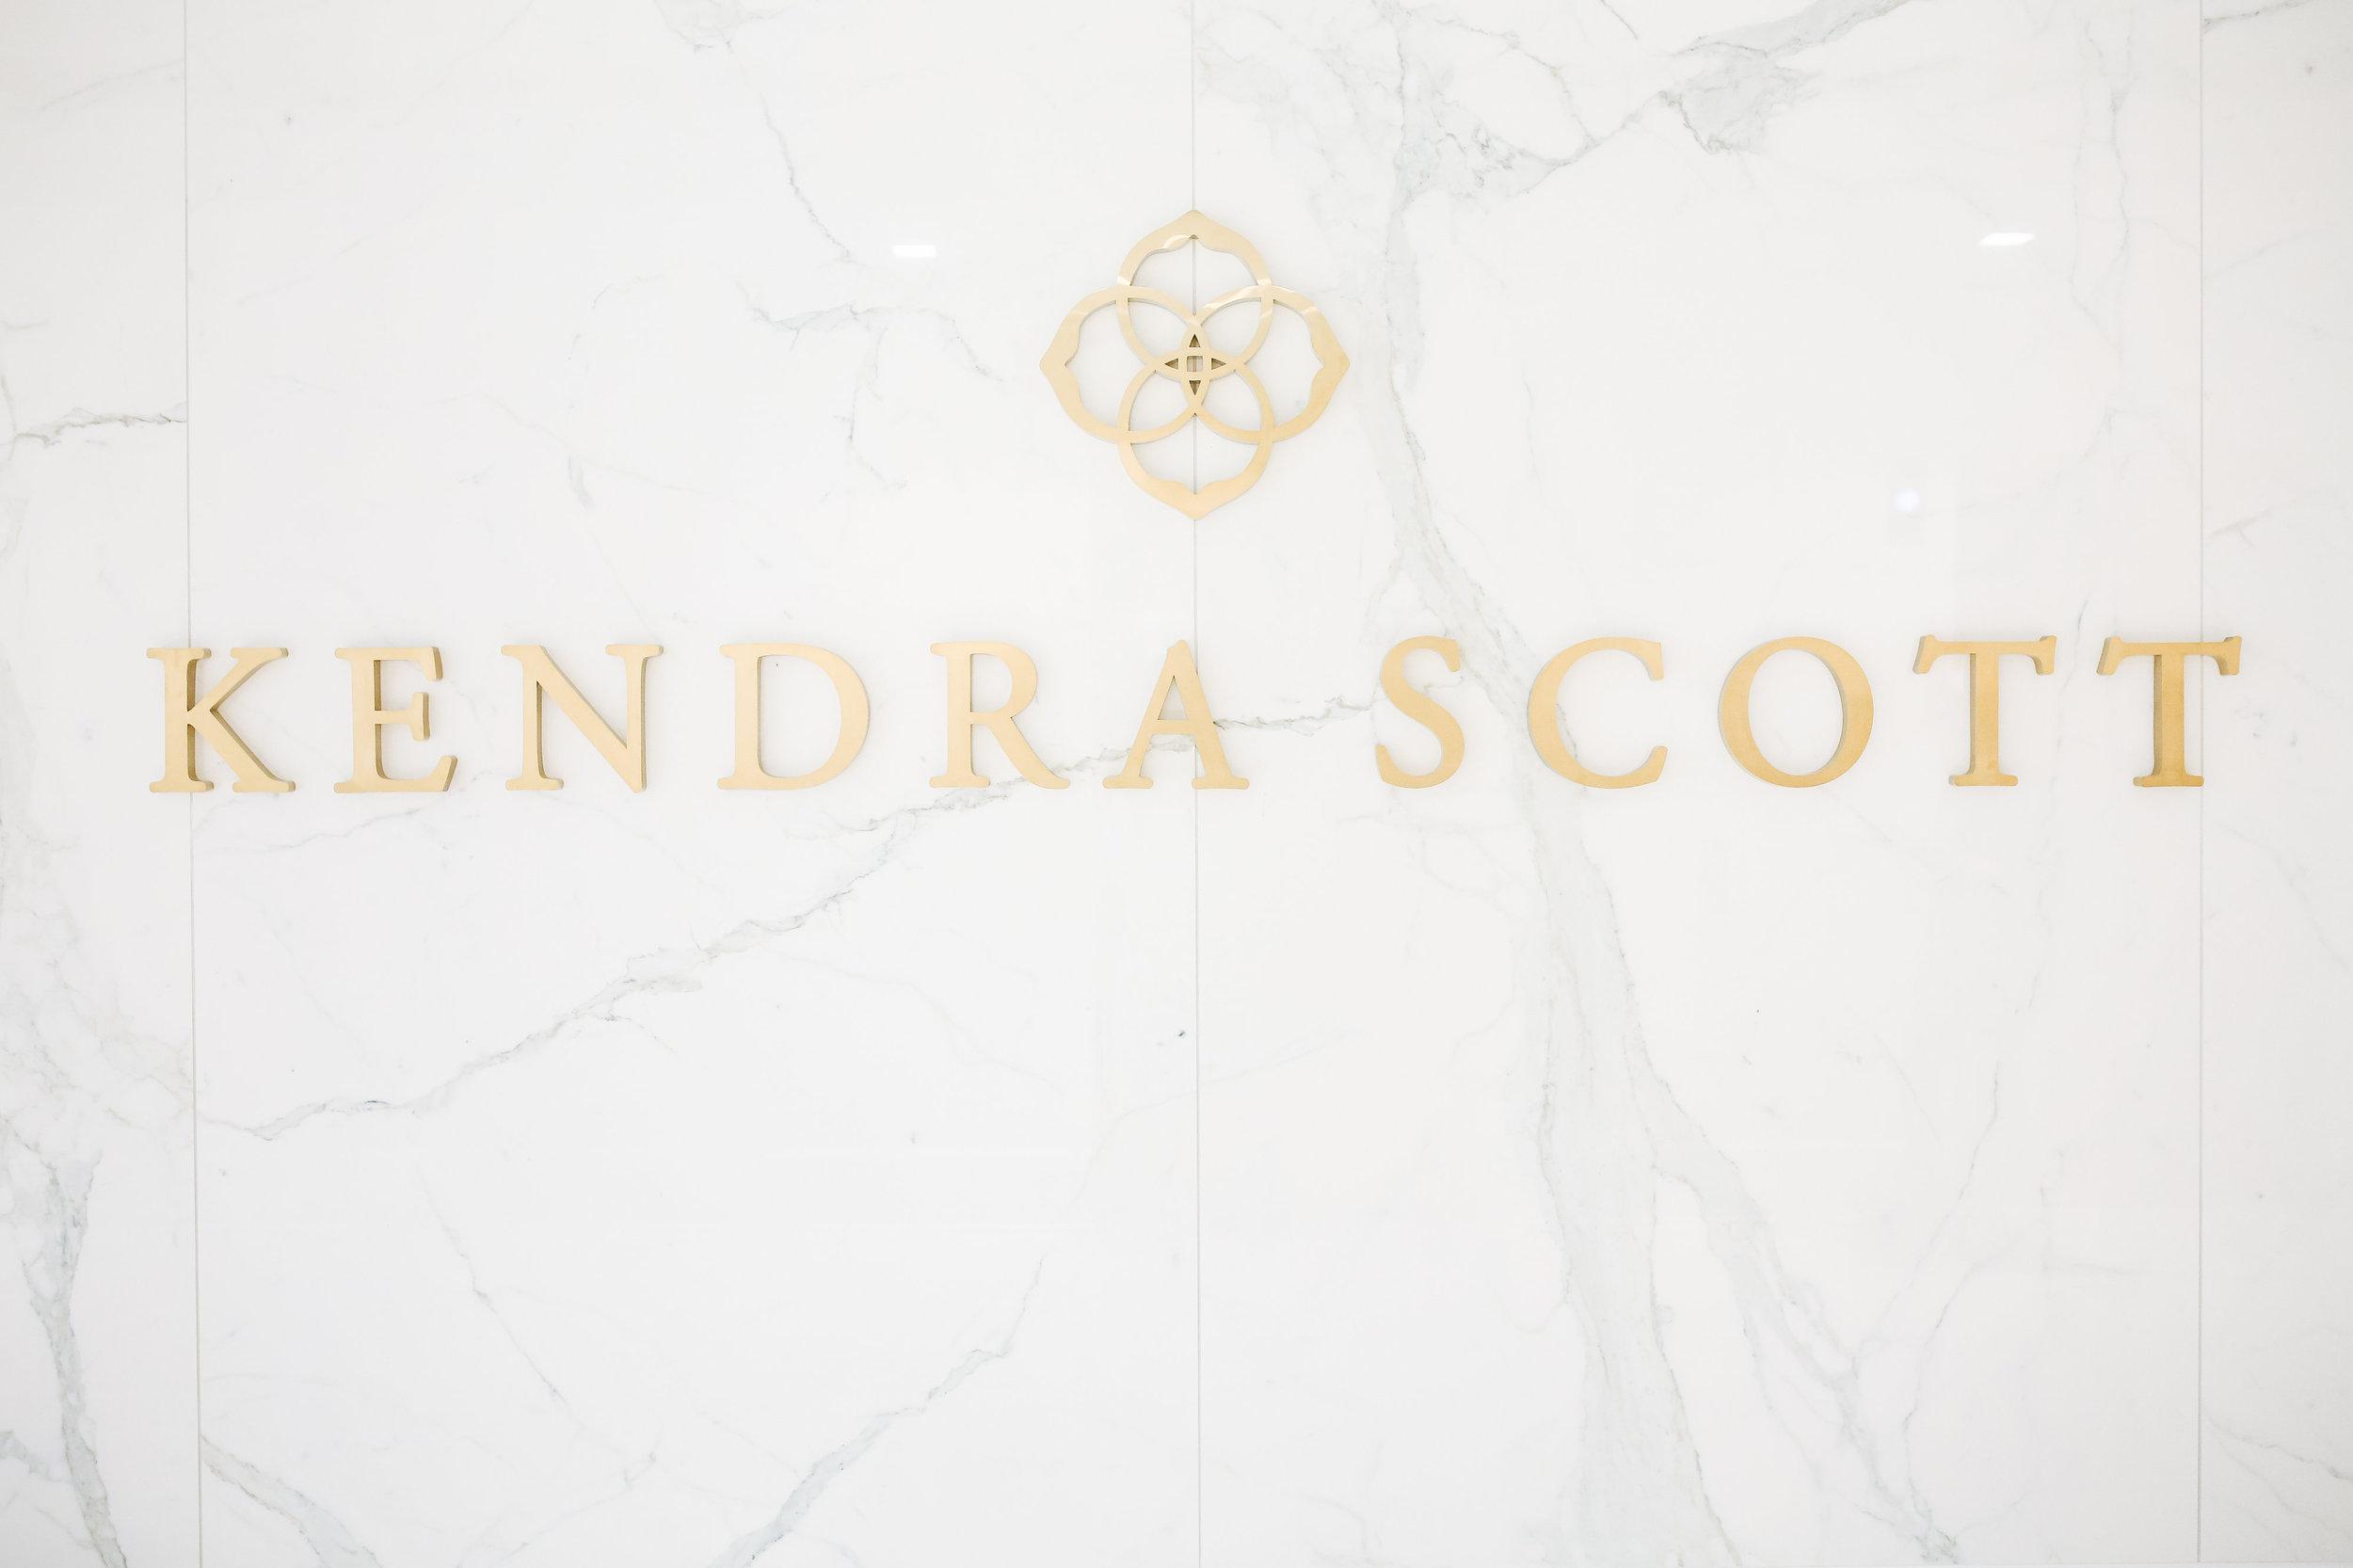 Kendra Scott Office-0045.jpg